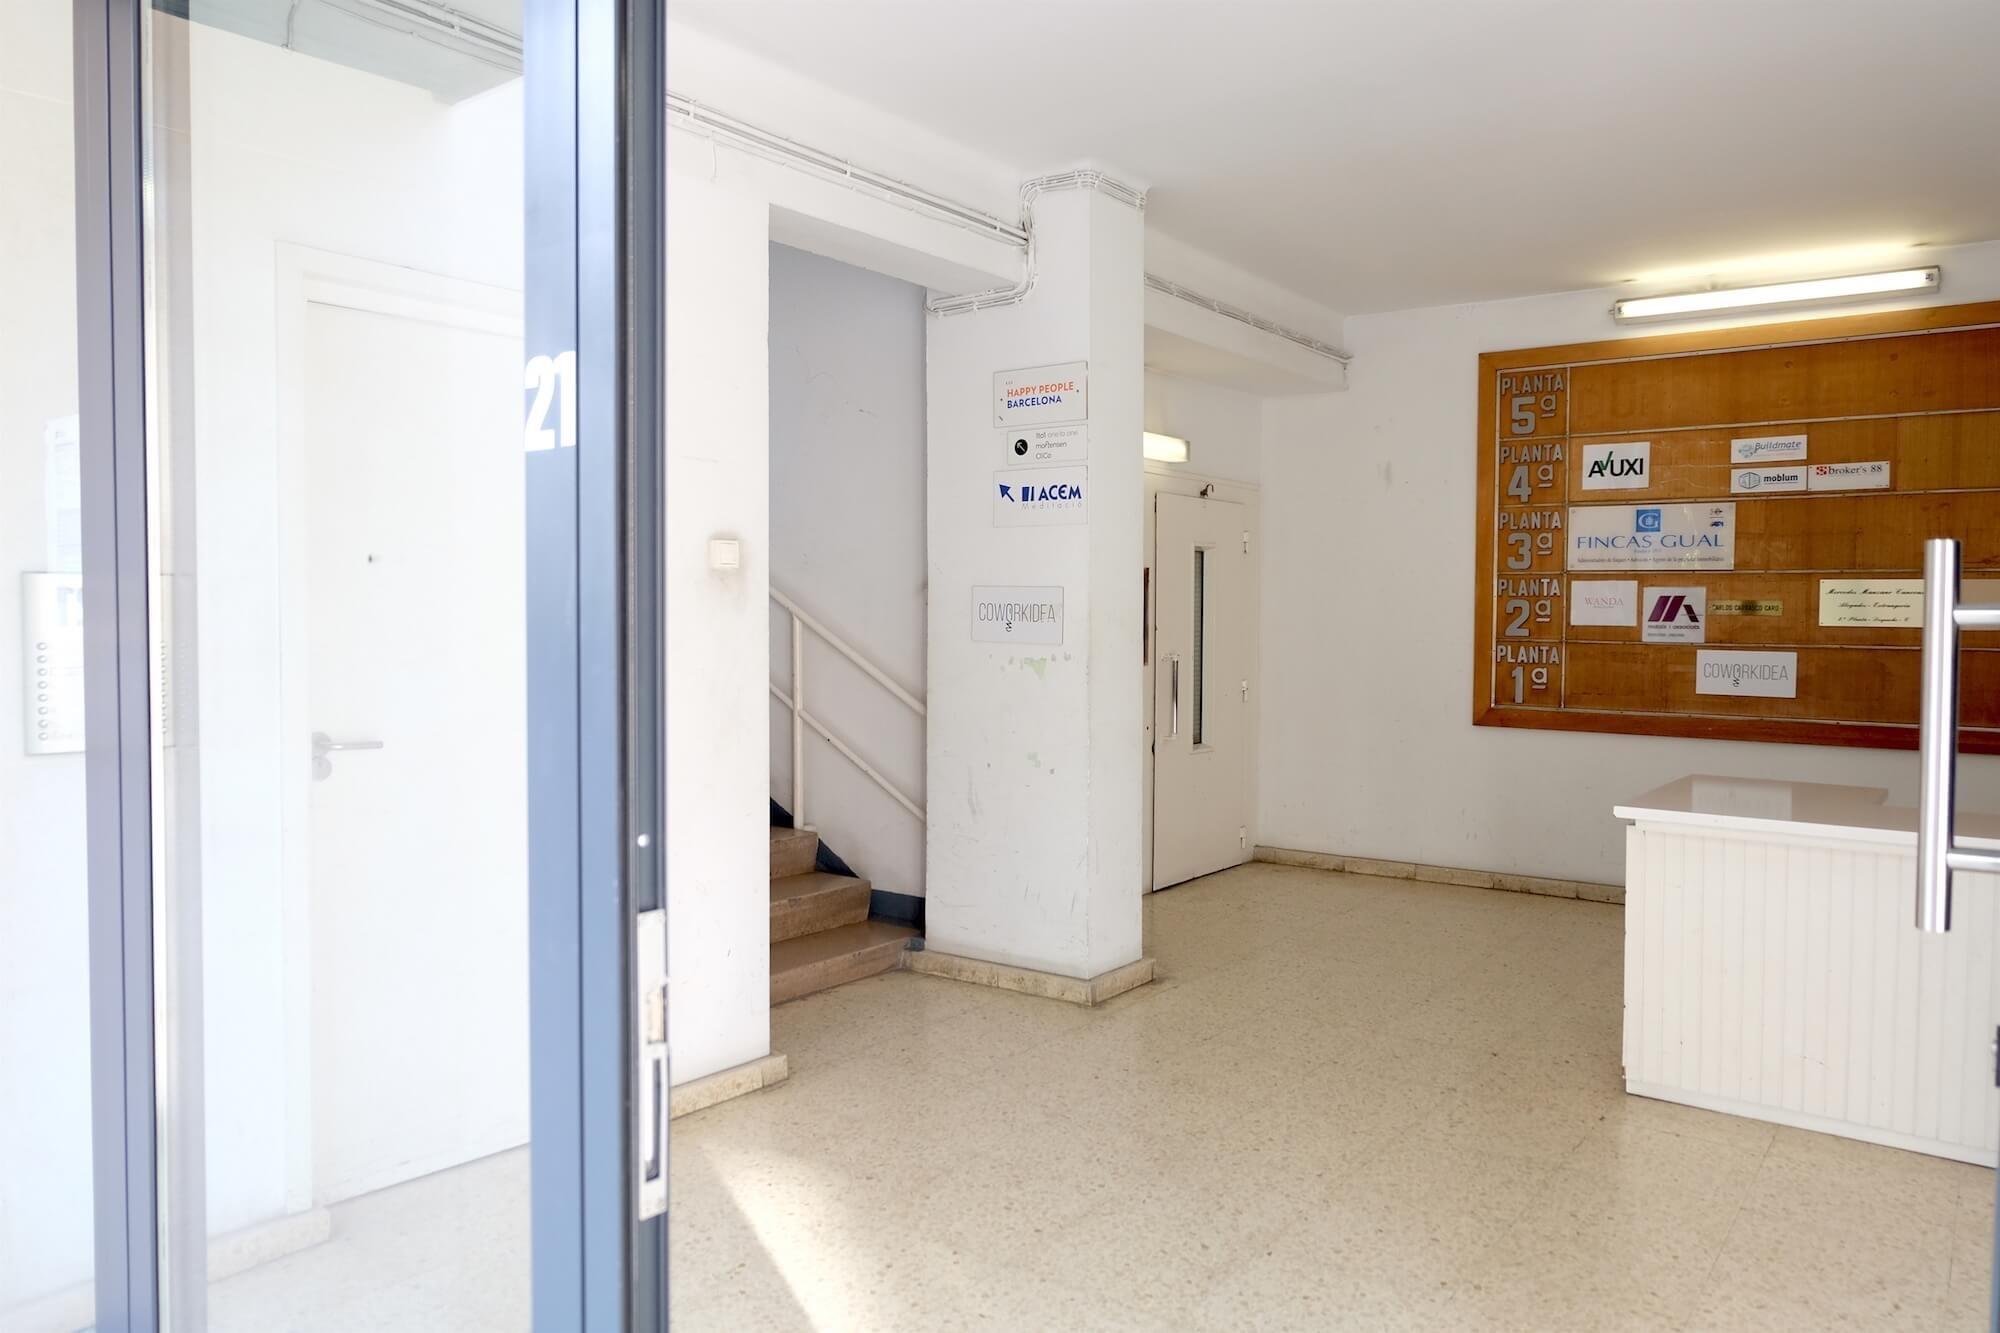 Фотоэкскурсия по коворкингу «Coworkidea» (Барселона) - 7